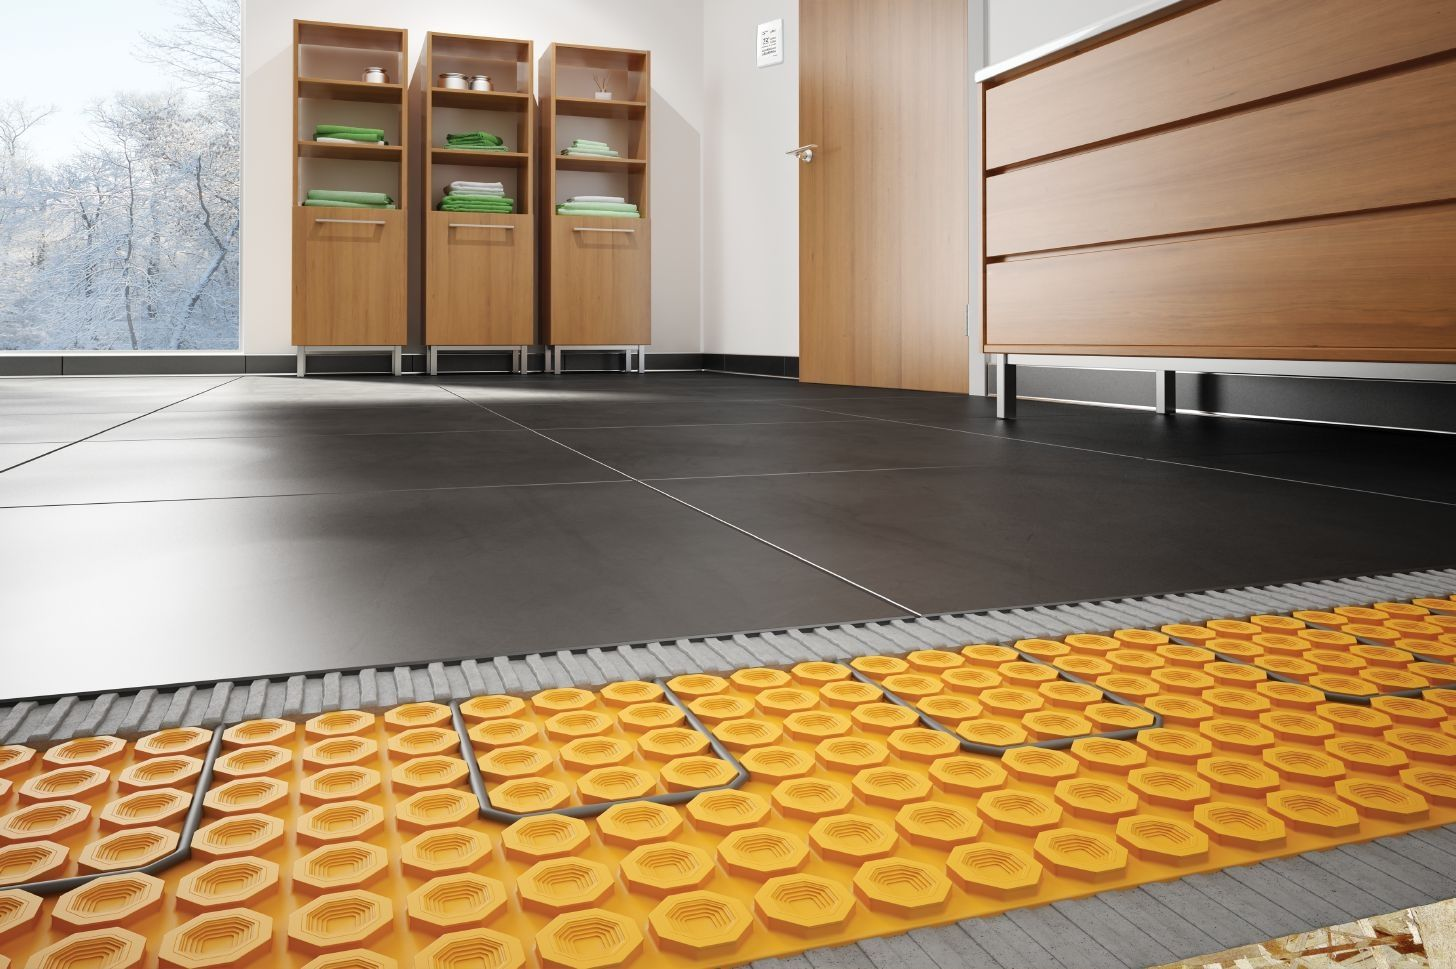 Heated Underlayment For Tile Floors Floor heating